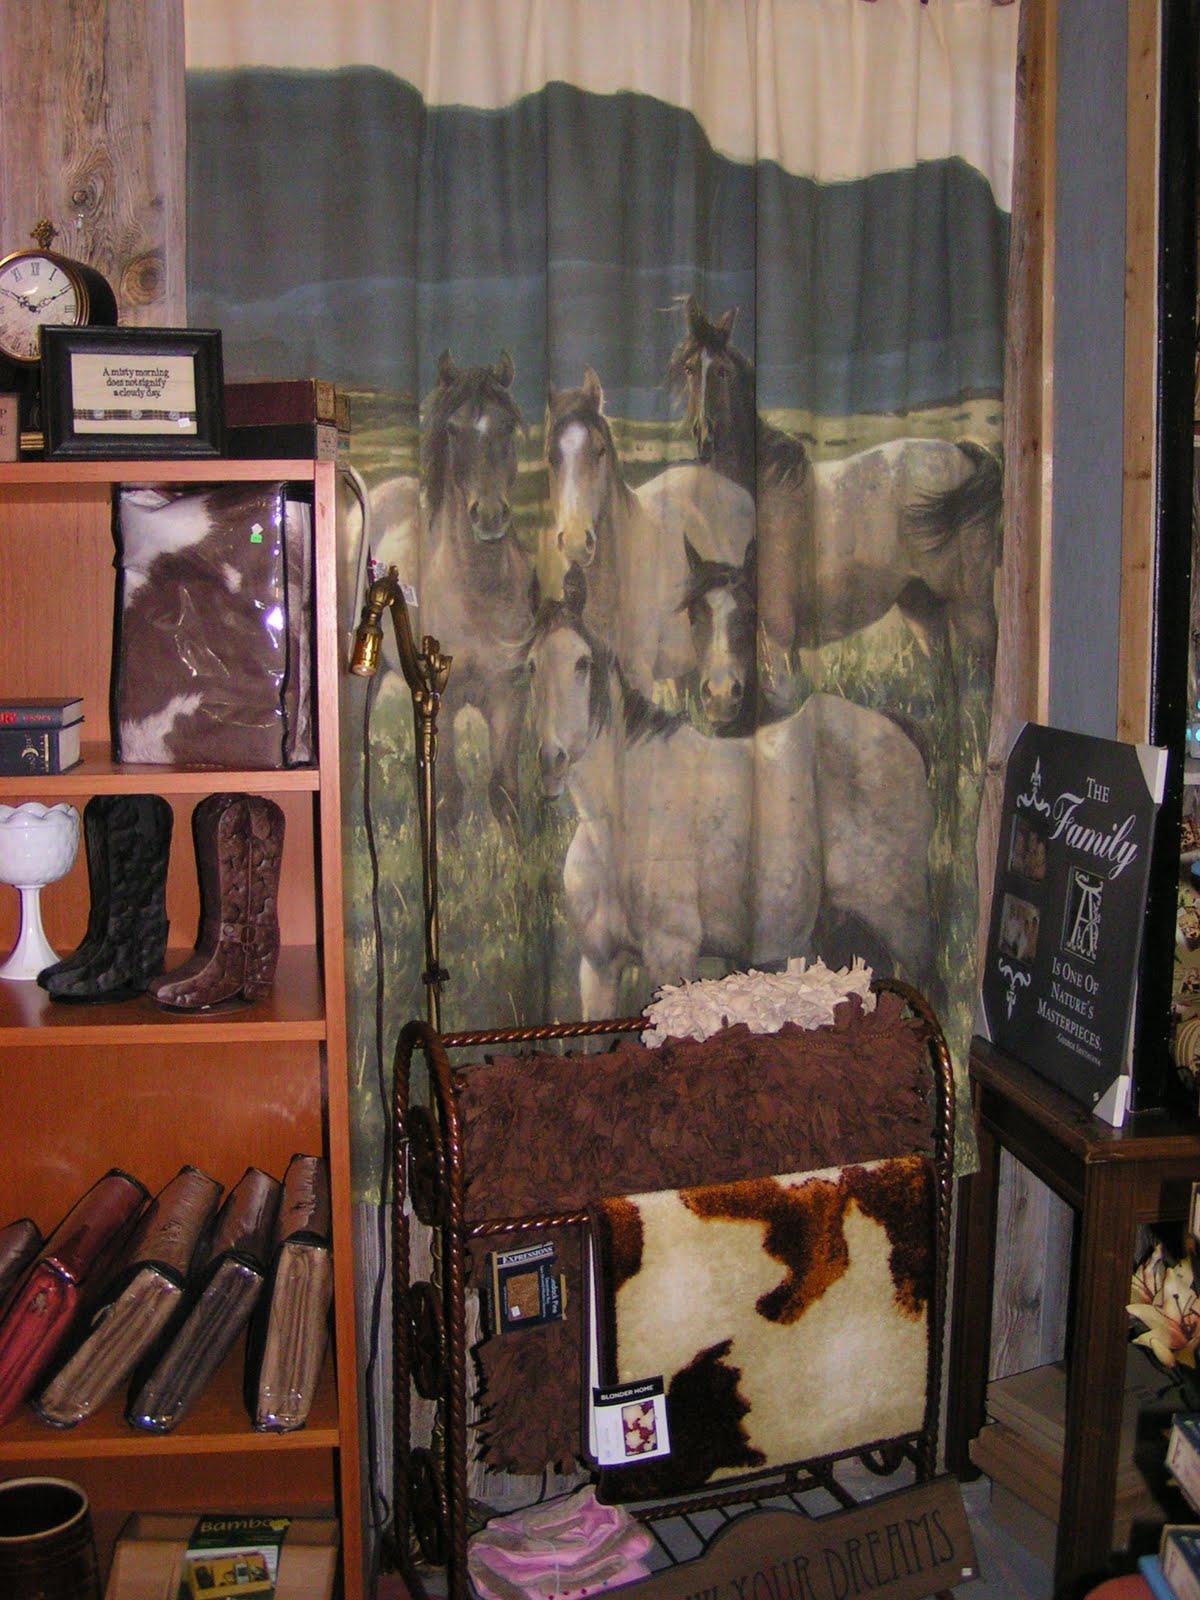 jojo west shop cotton bed sweet bath kids deals curtains denim shower s curtain wild designs exclusive cowboy western and blue